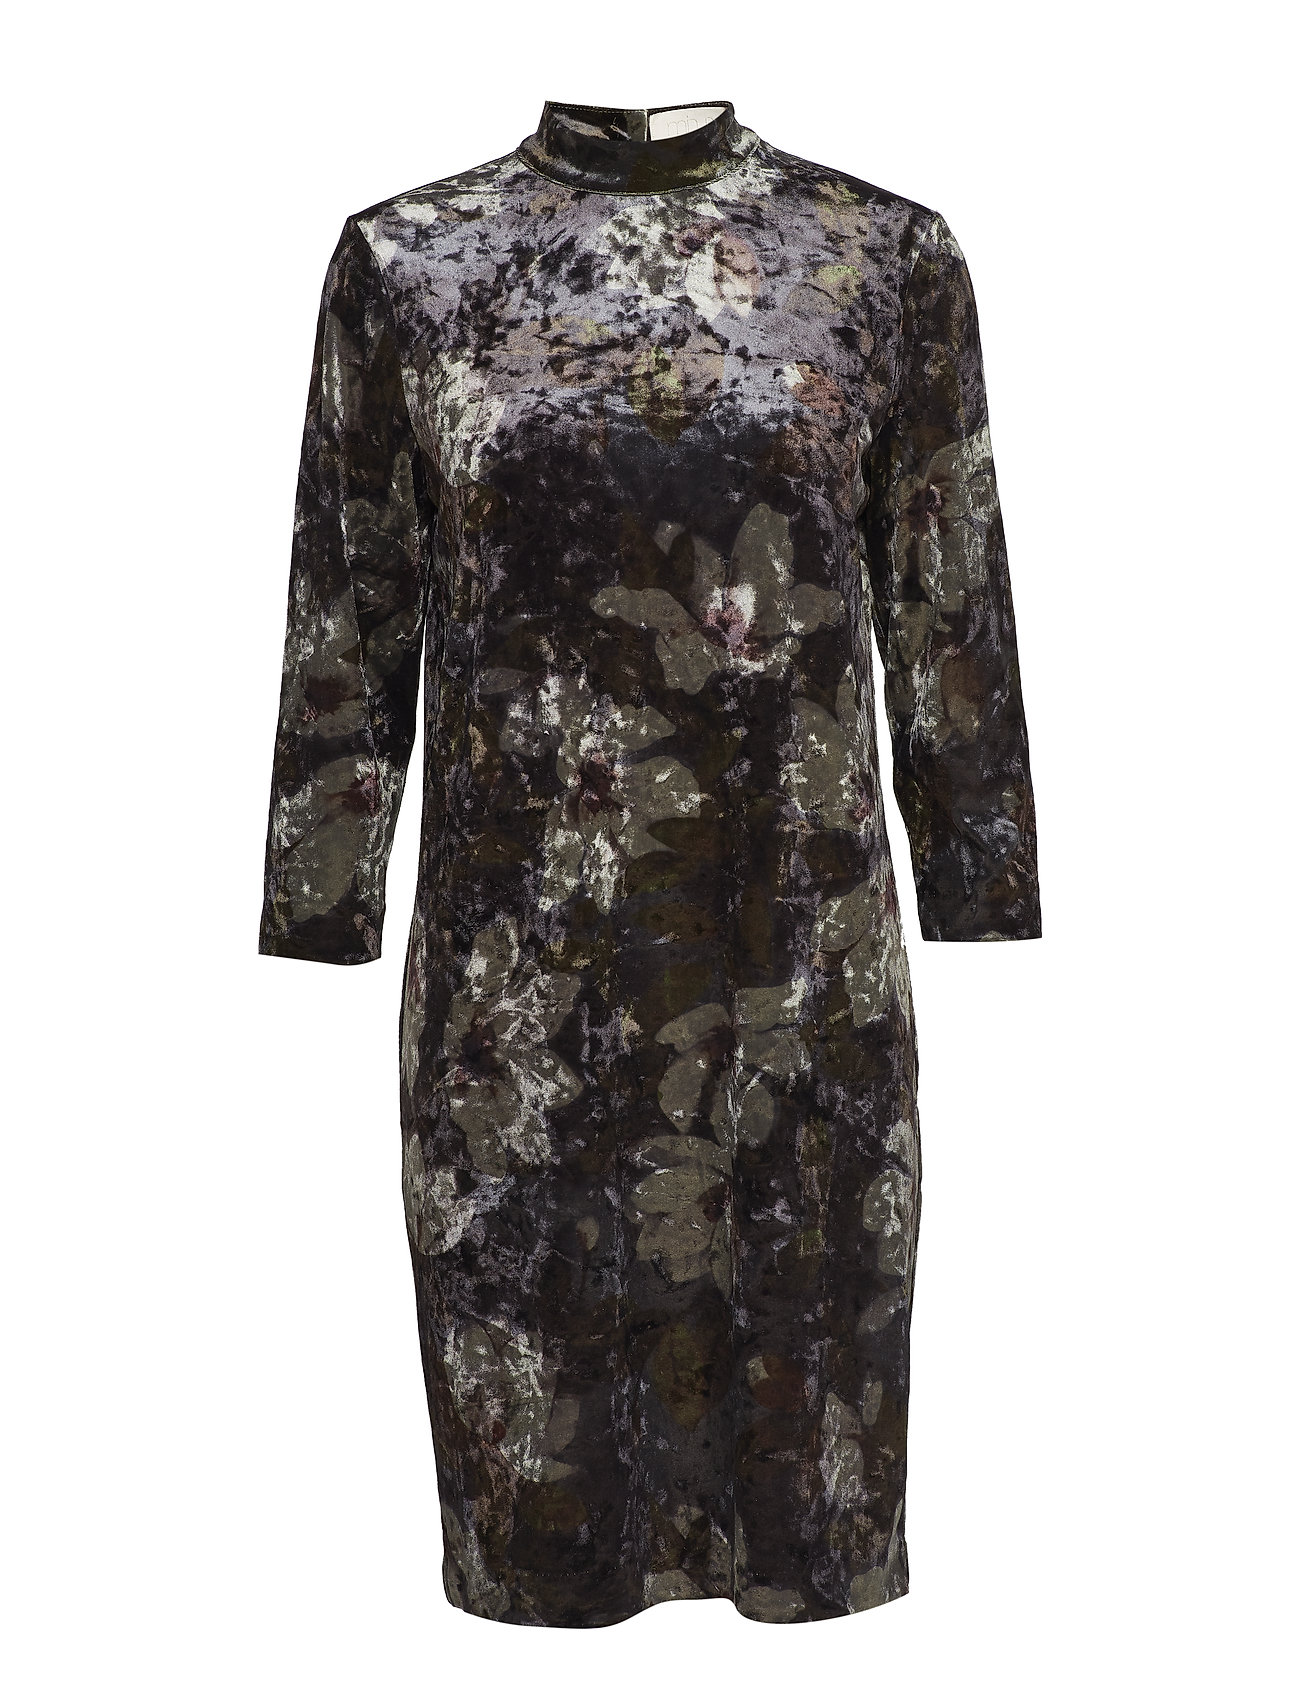 Minus Riba dress - VELOUR FLOWER PRINT